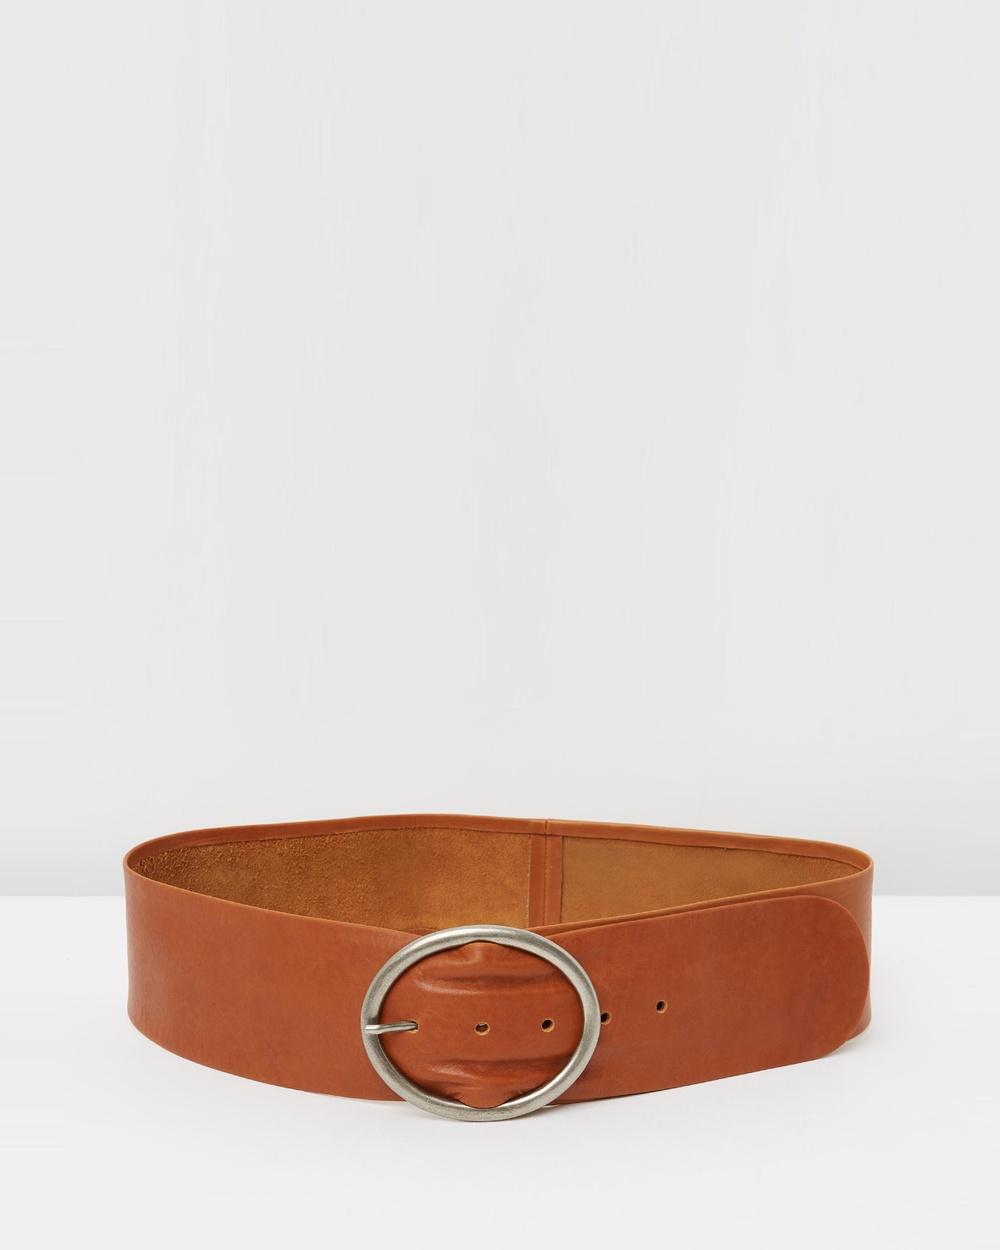 Loop Leather Co Peyton Belts Cognac Tan